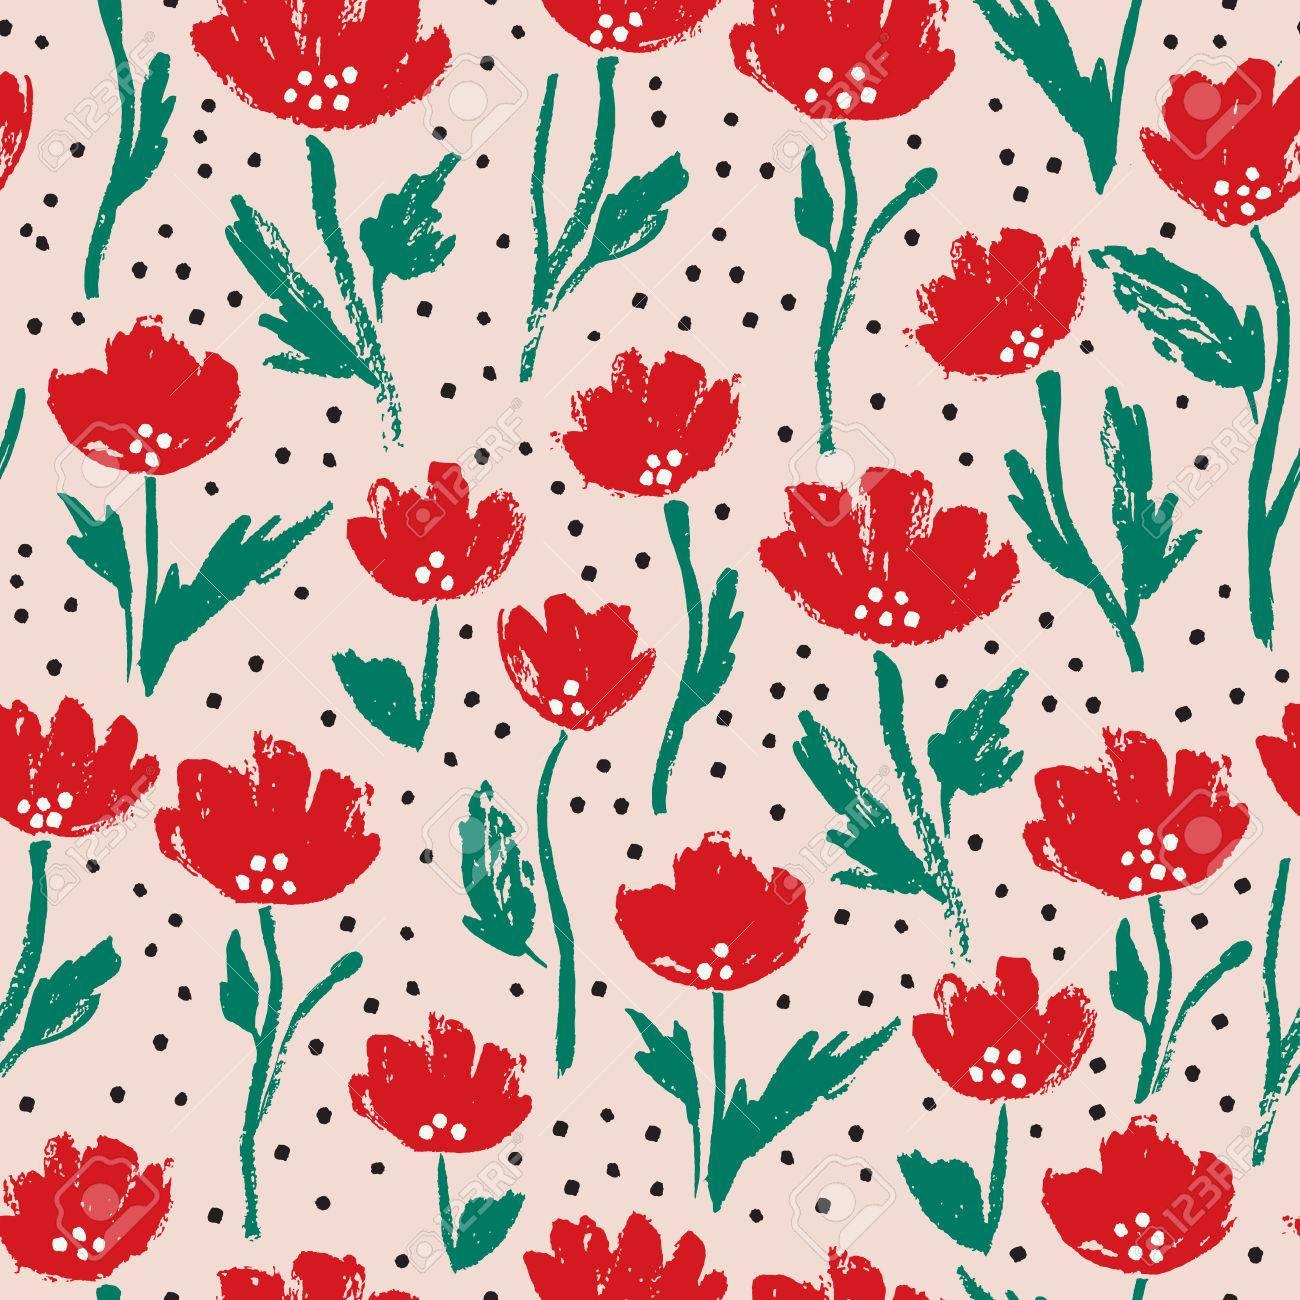 Watercolor Summer Poppy Flower Pattern Vector Nature Seamless